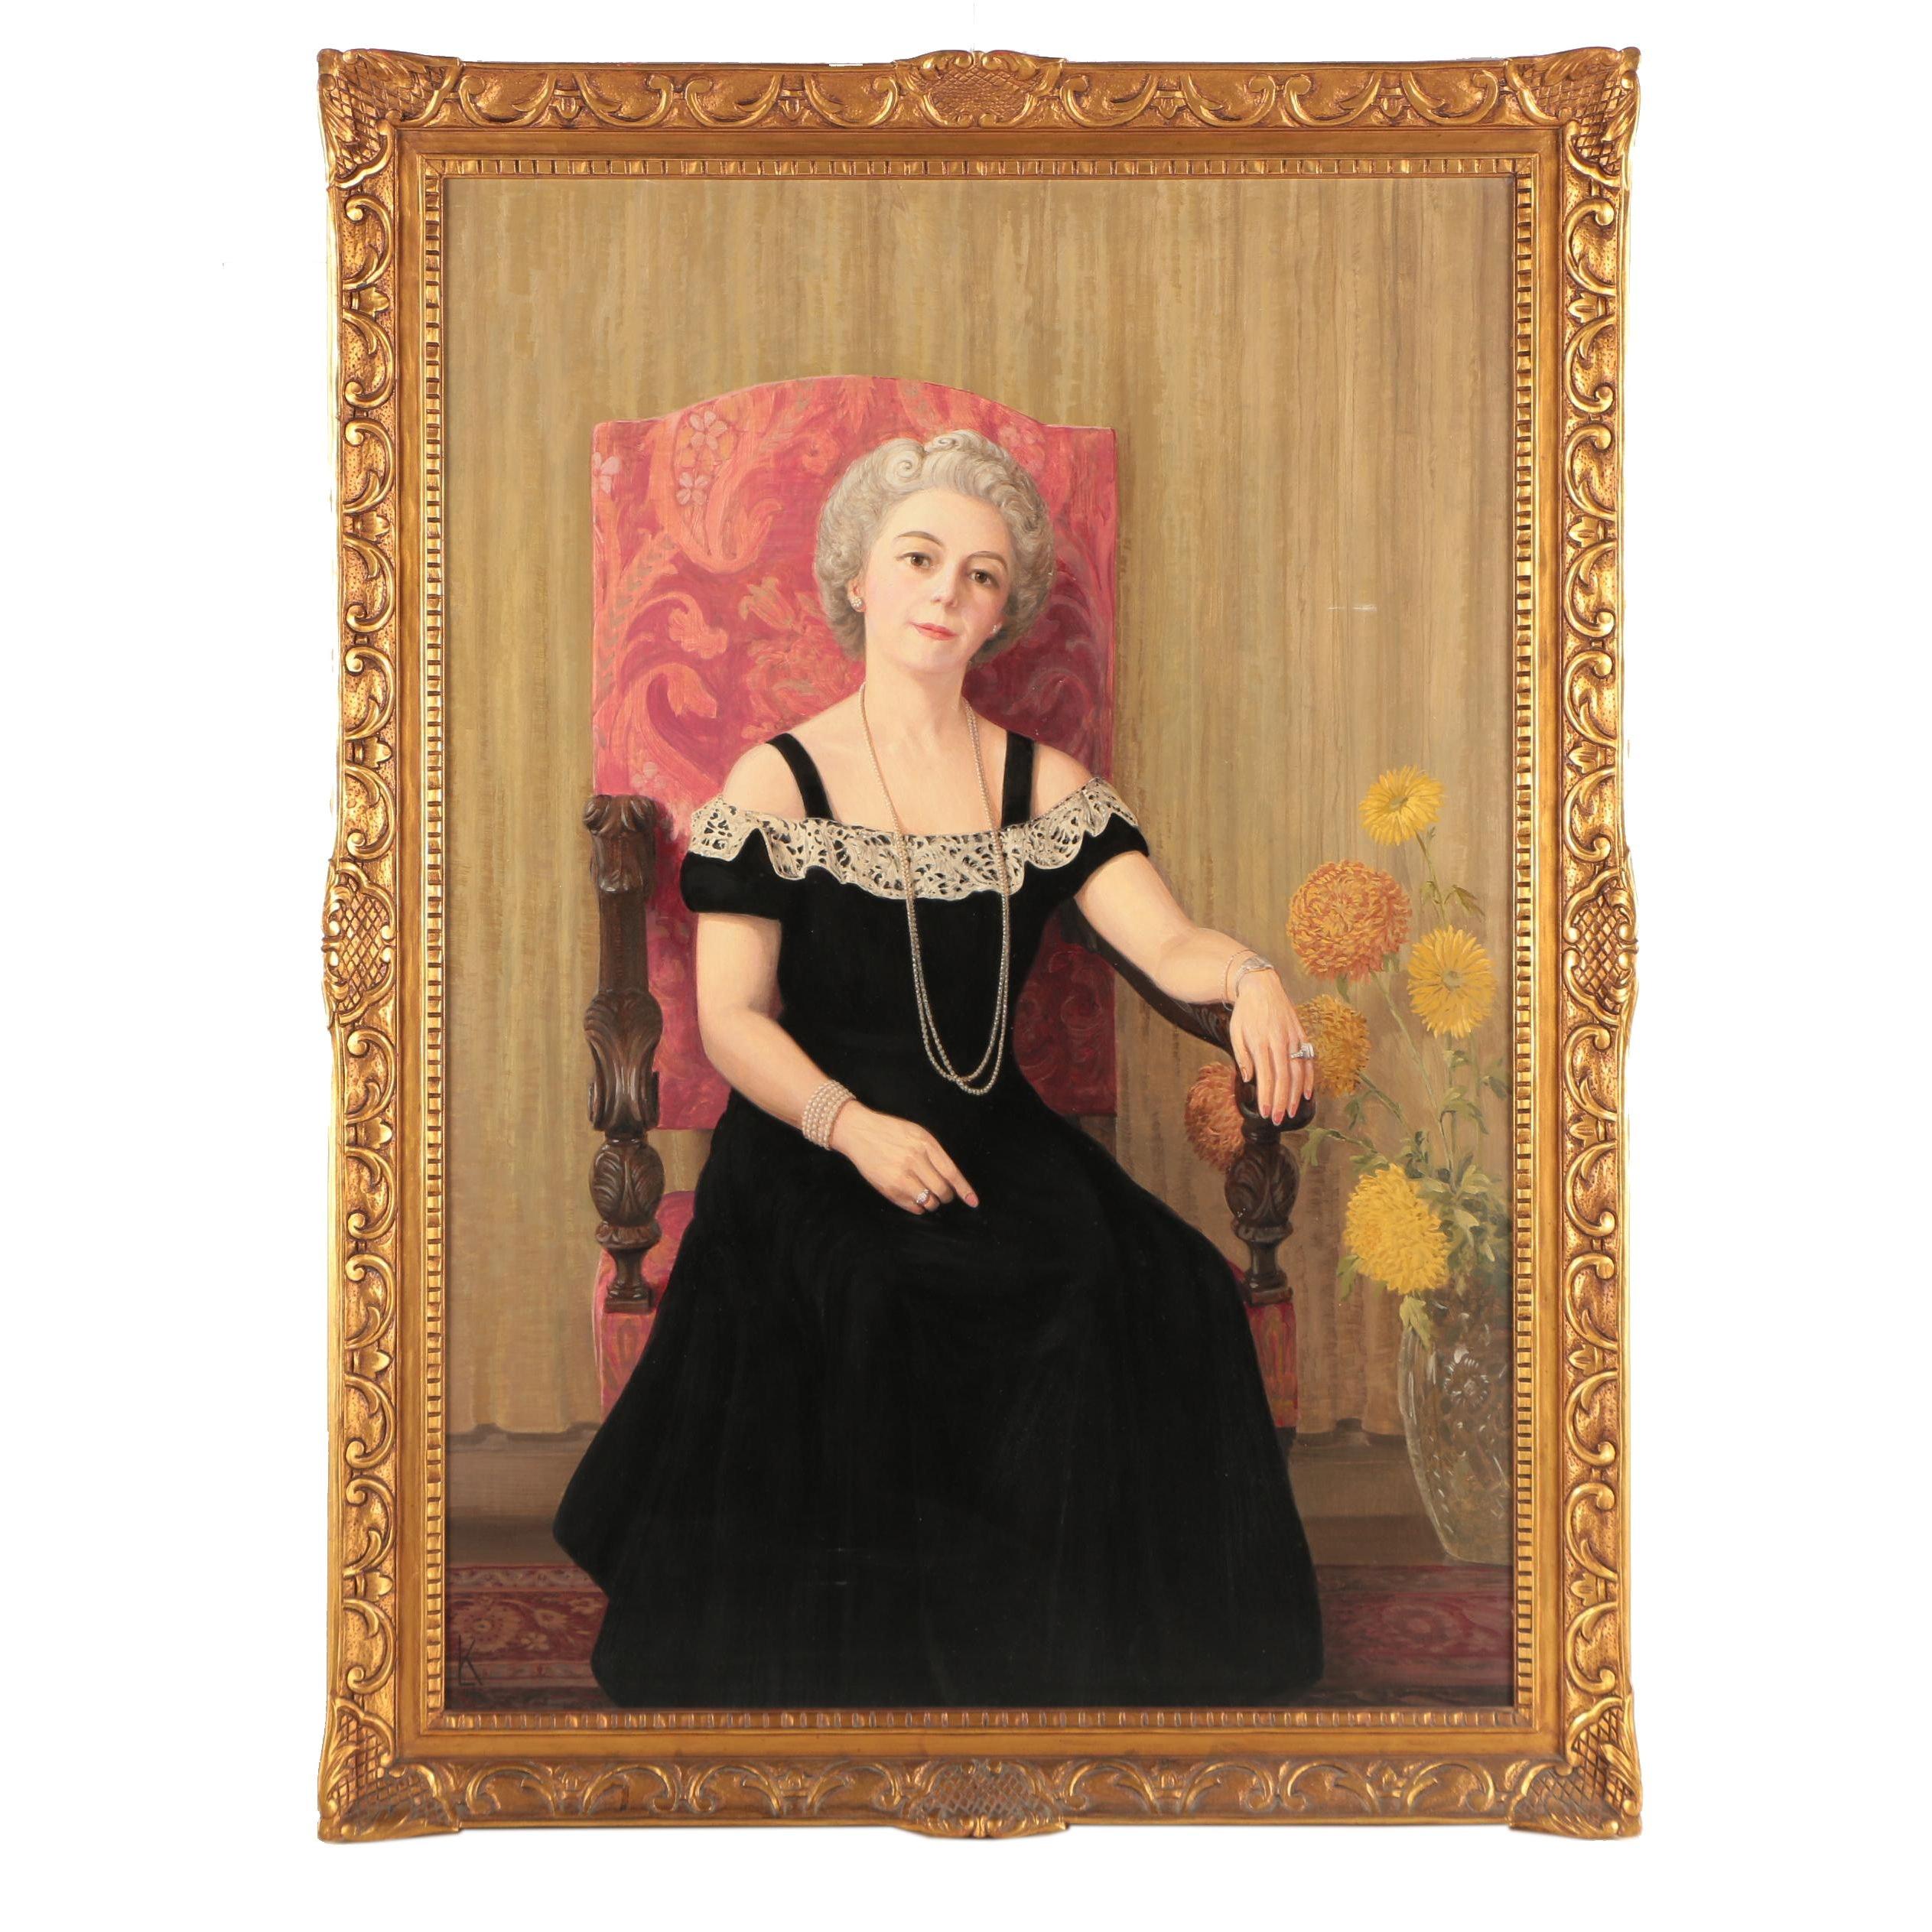 LK Oil Portrait Painting of a Woman